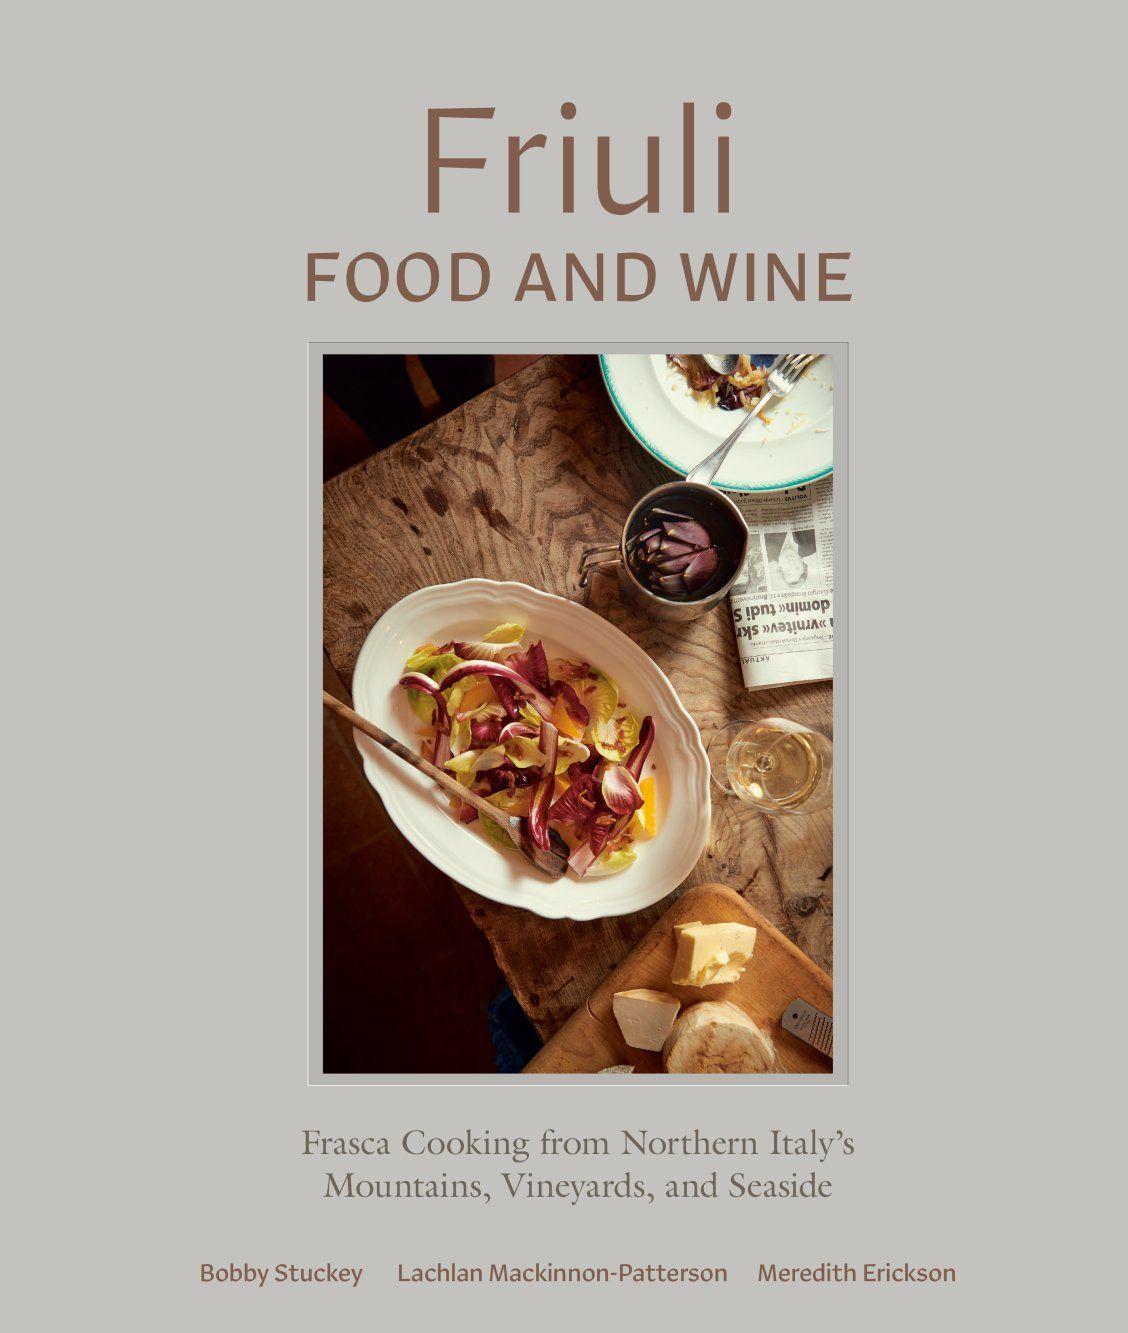 Friuli food and wine by bobby stuckey lachlan mackinnon